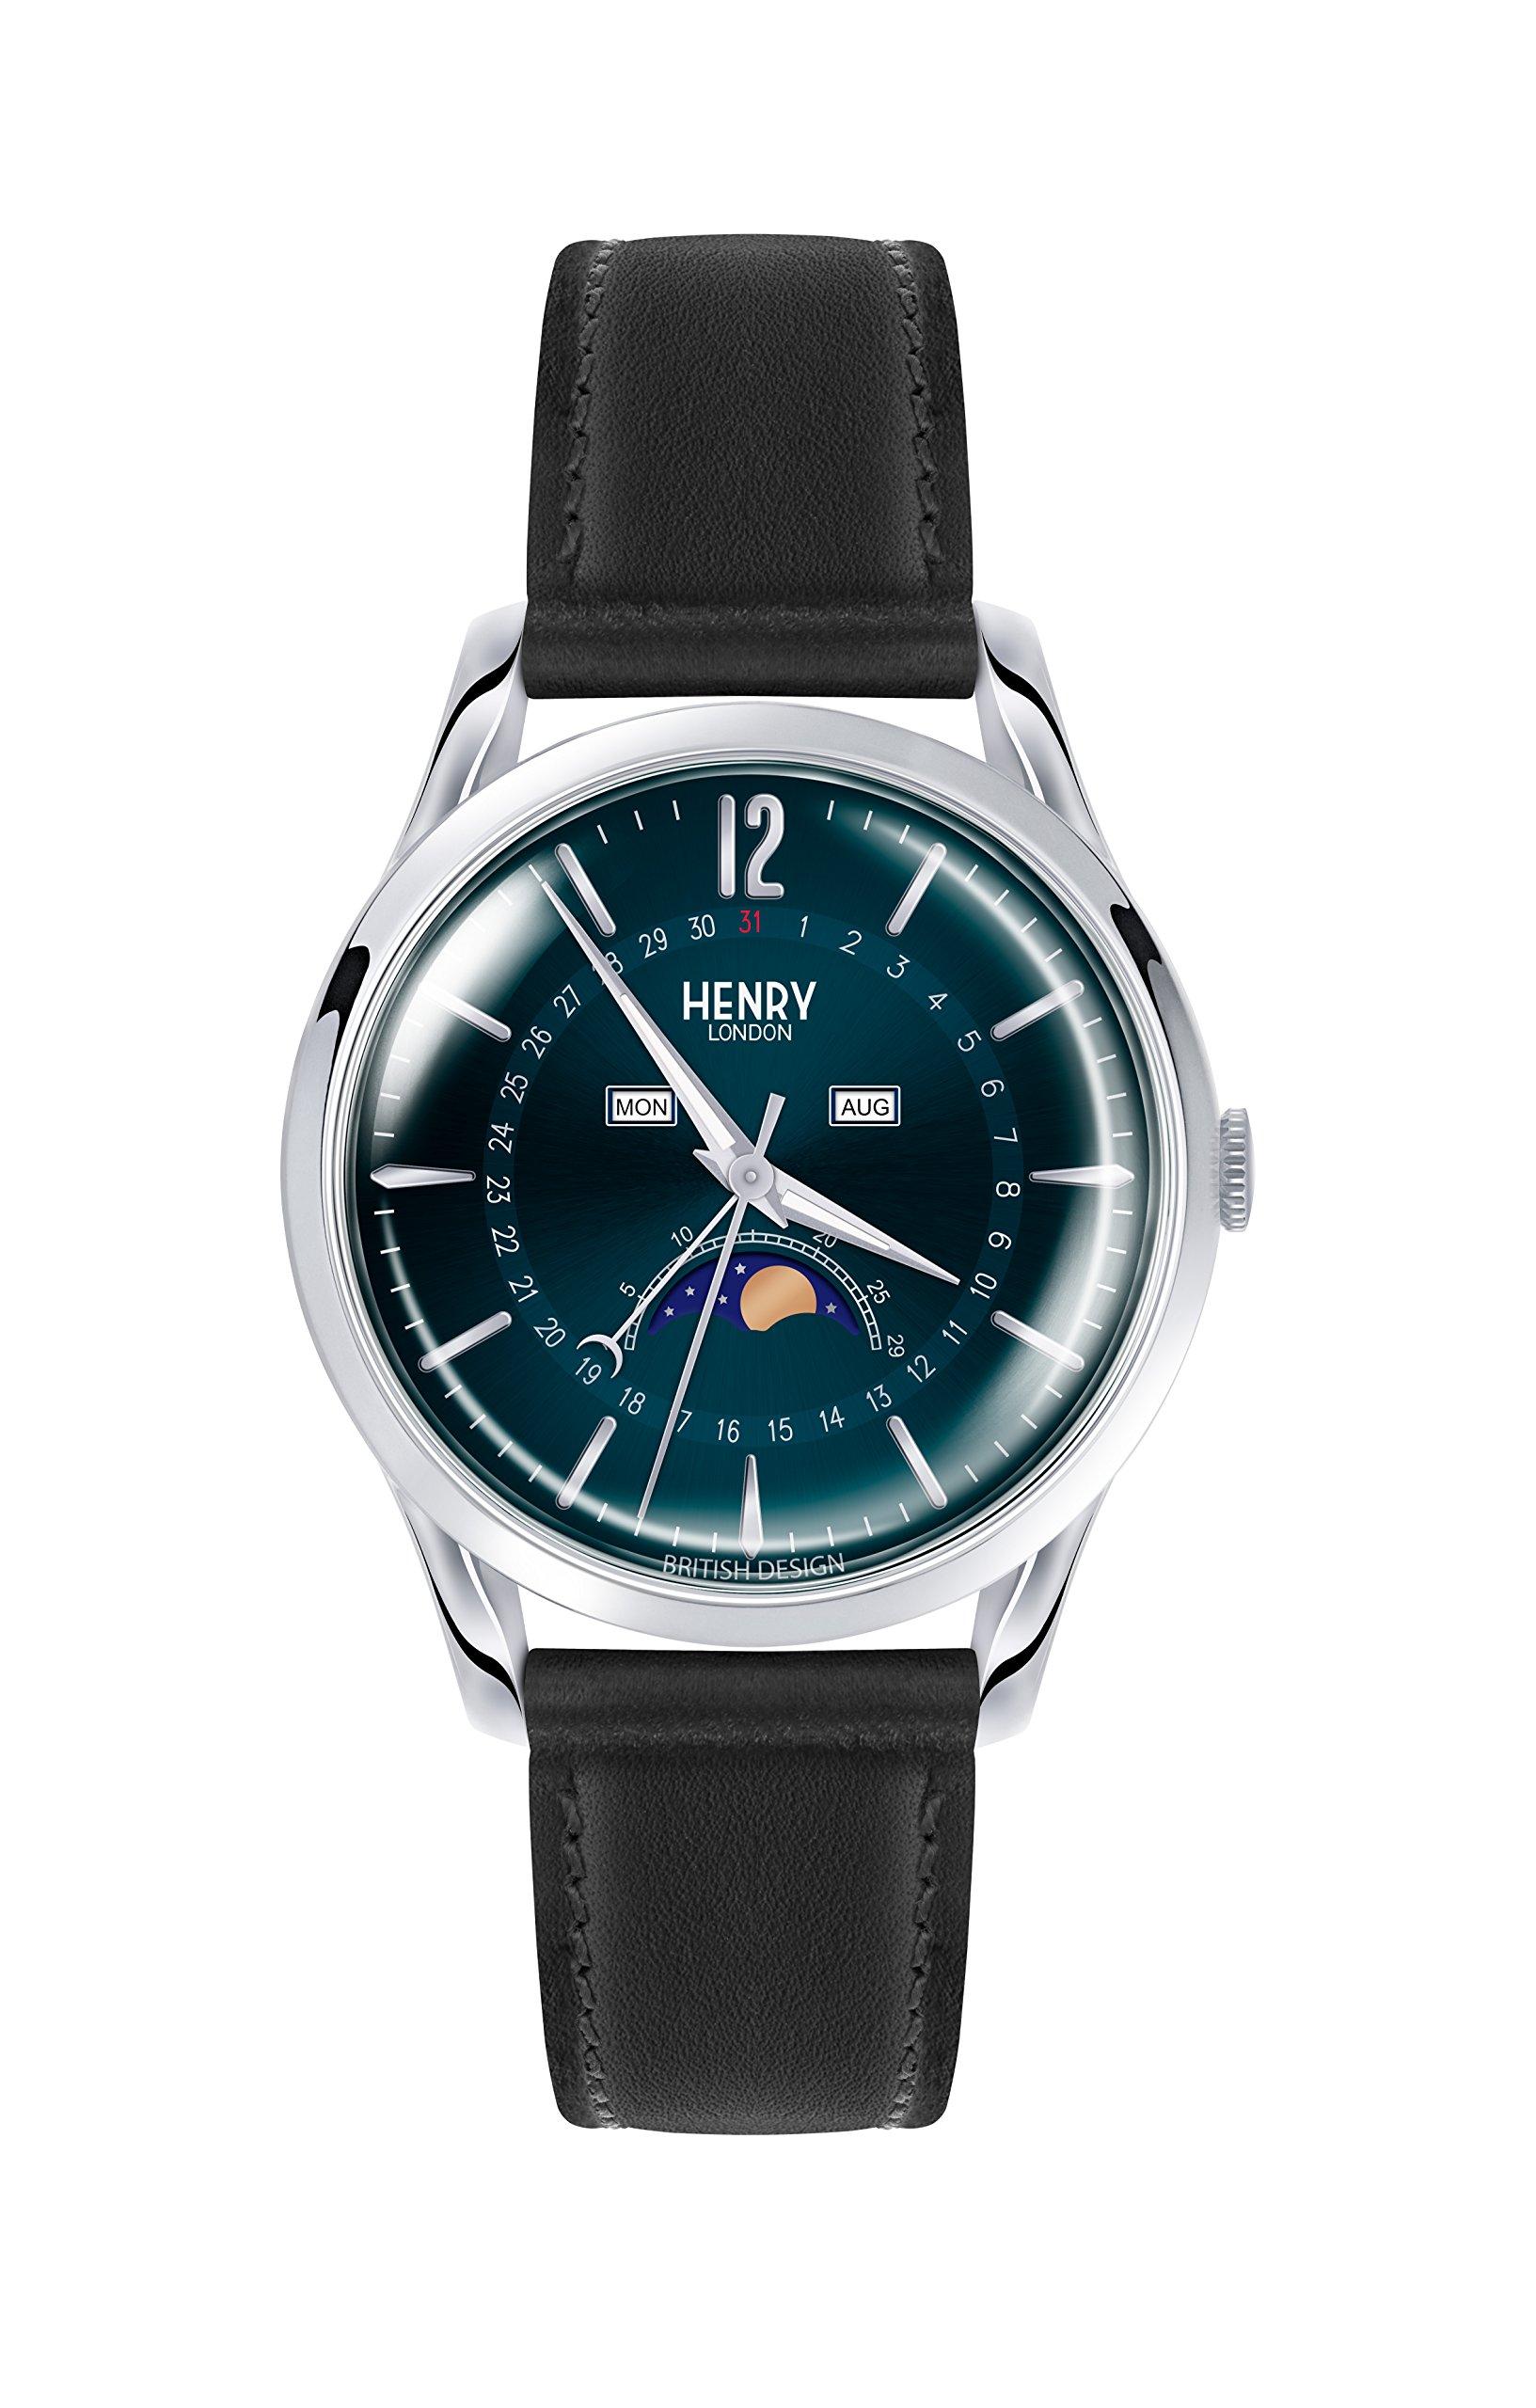 Henry London Unisex-Adult Leather Watch Strap HL39-LS-0071